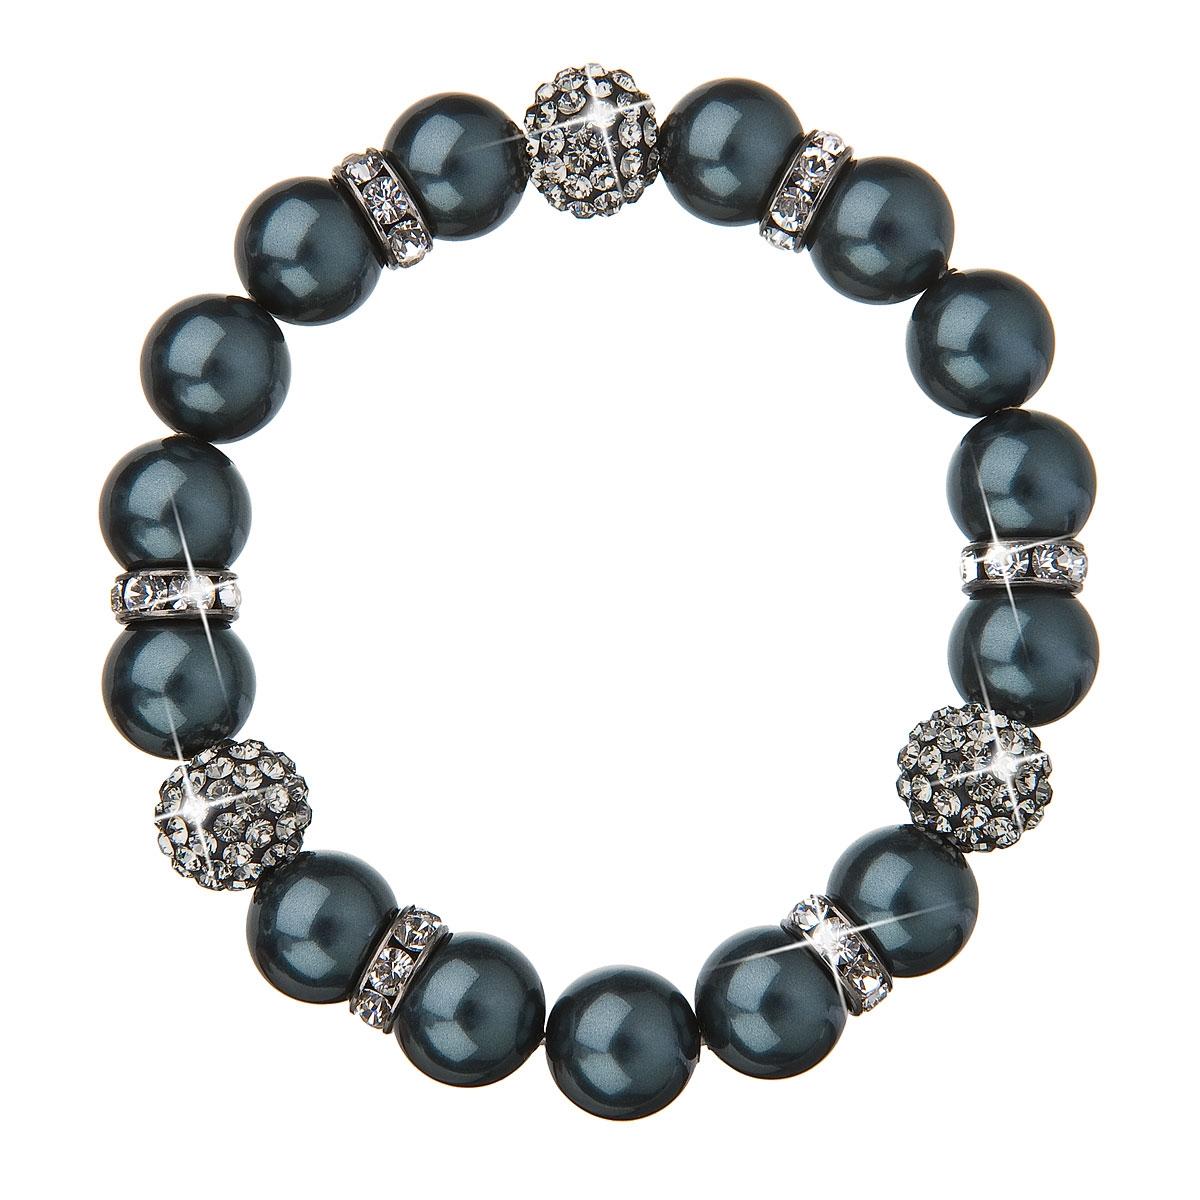 Perlový náramek tmavě zelené perly Crystals from Swarovski®